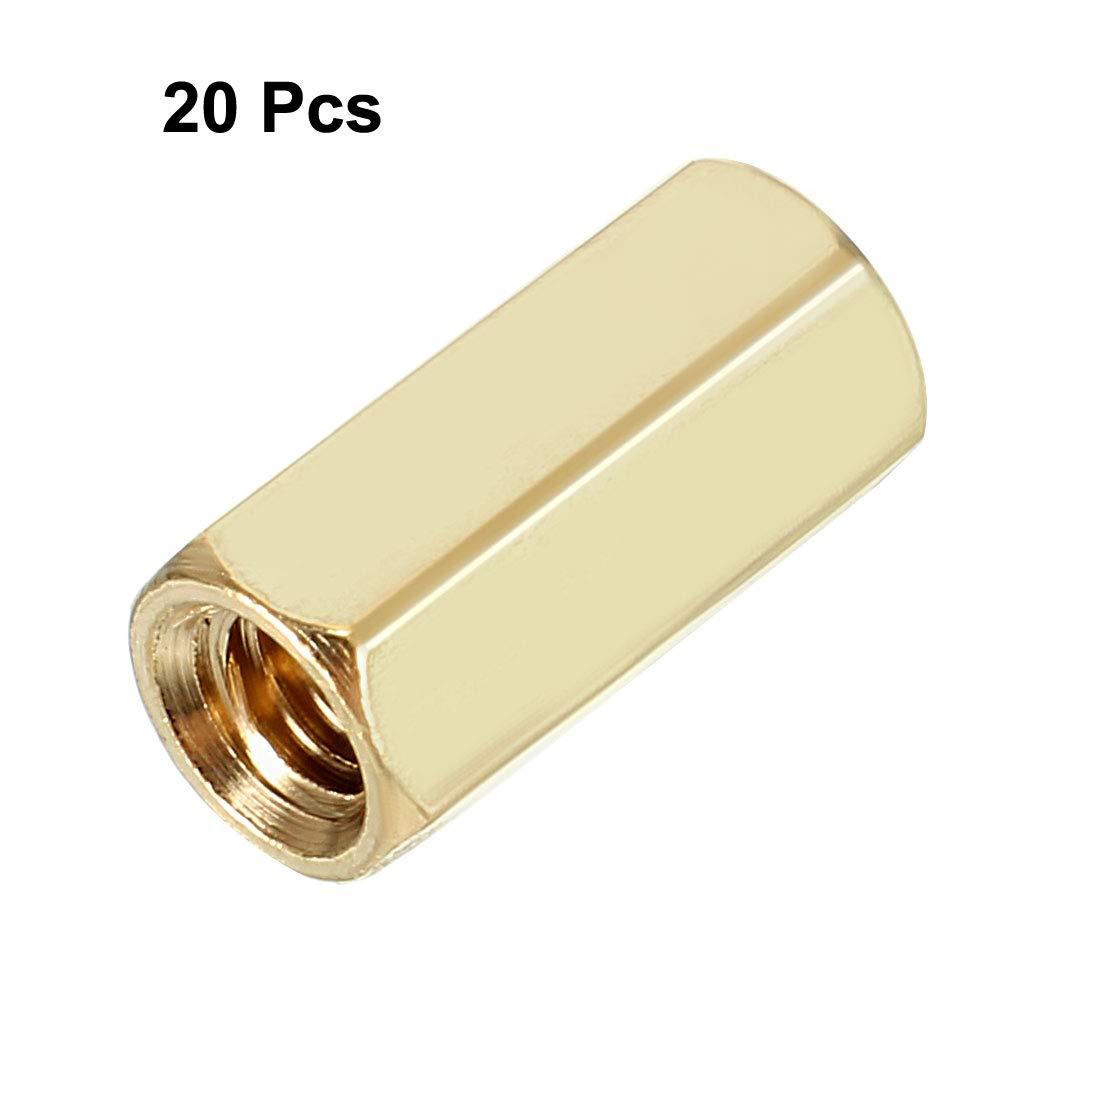 uxcell 15pcs Brass Straight PCB Pillar Female Thread Hex Standoff Spacer M3x5x12mm